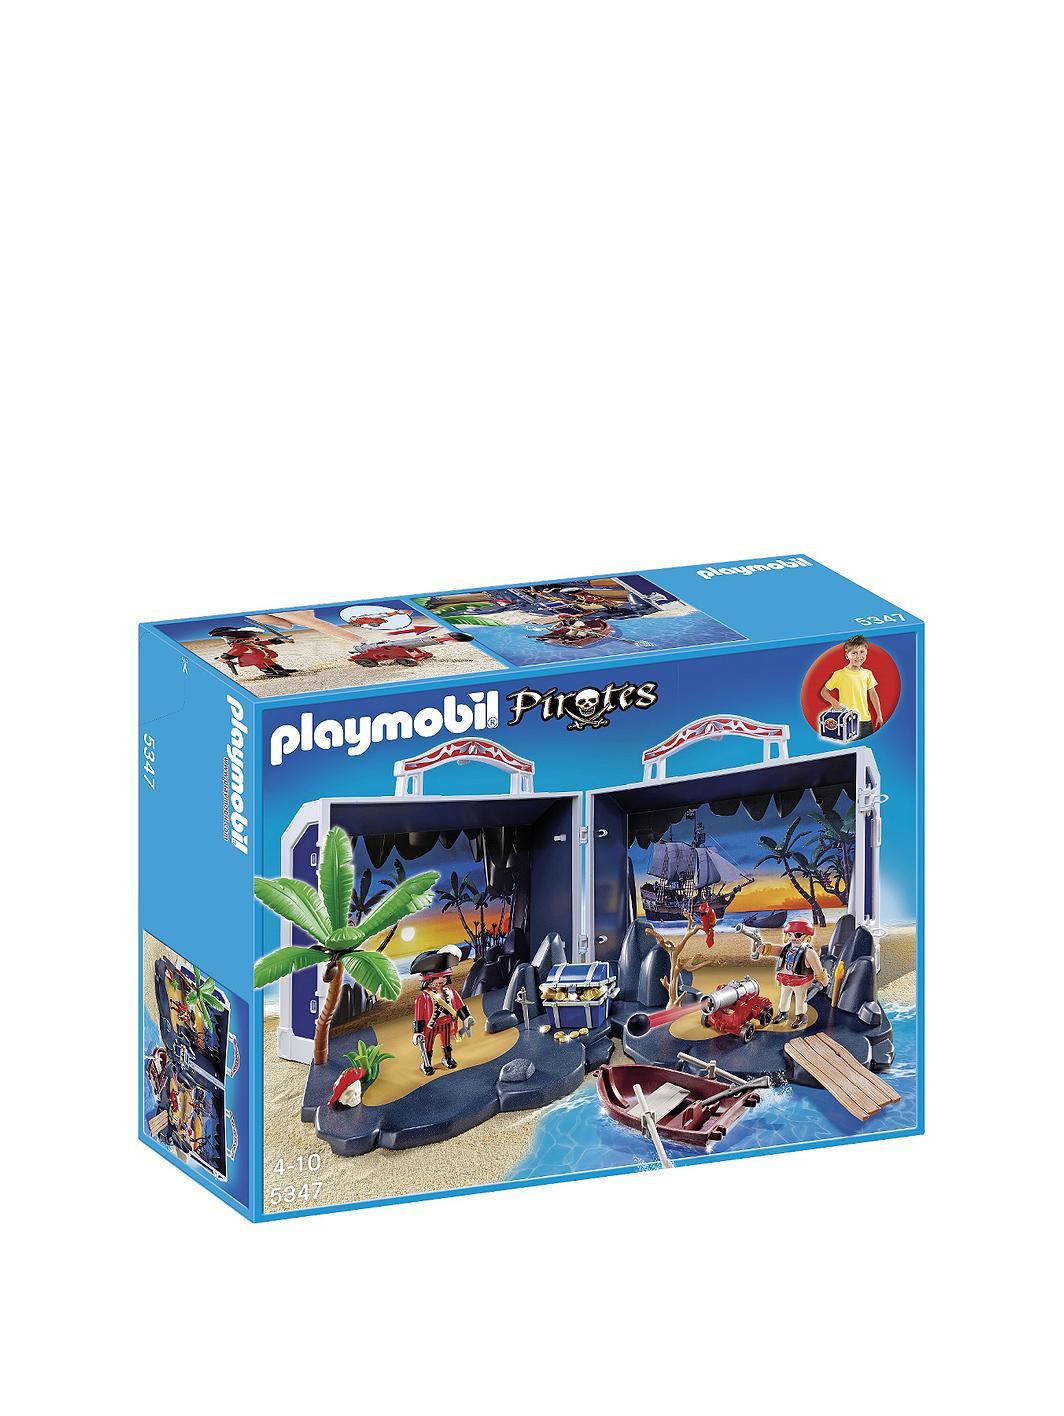 Playmobil Take Along Pirate Treasure Chest Playmobil-take-along-pirates